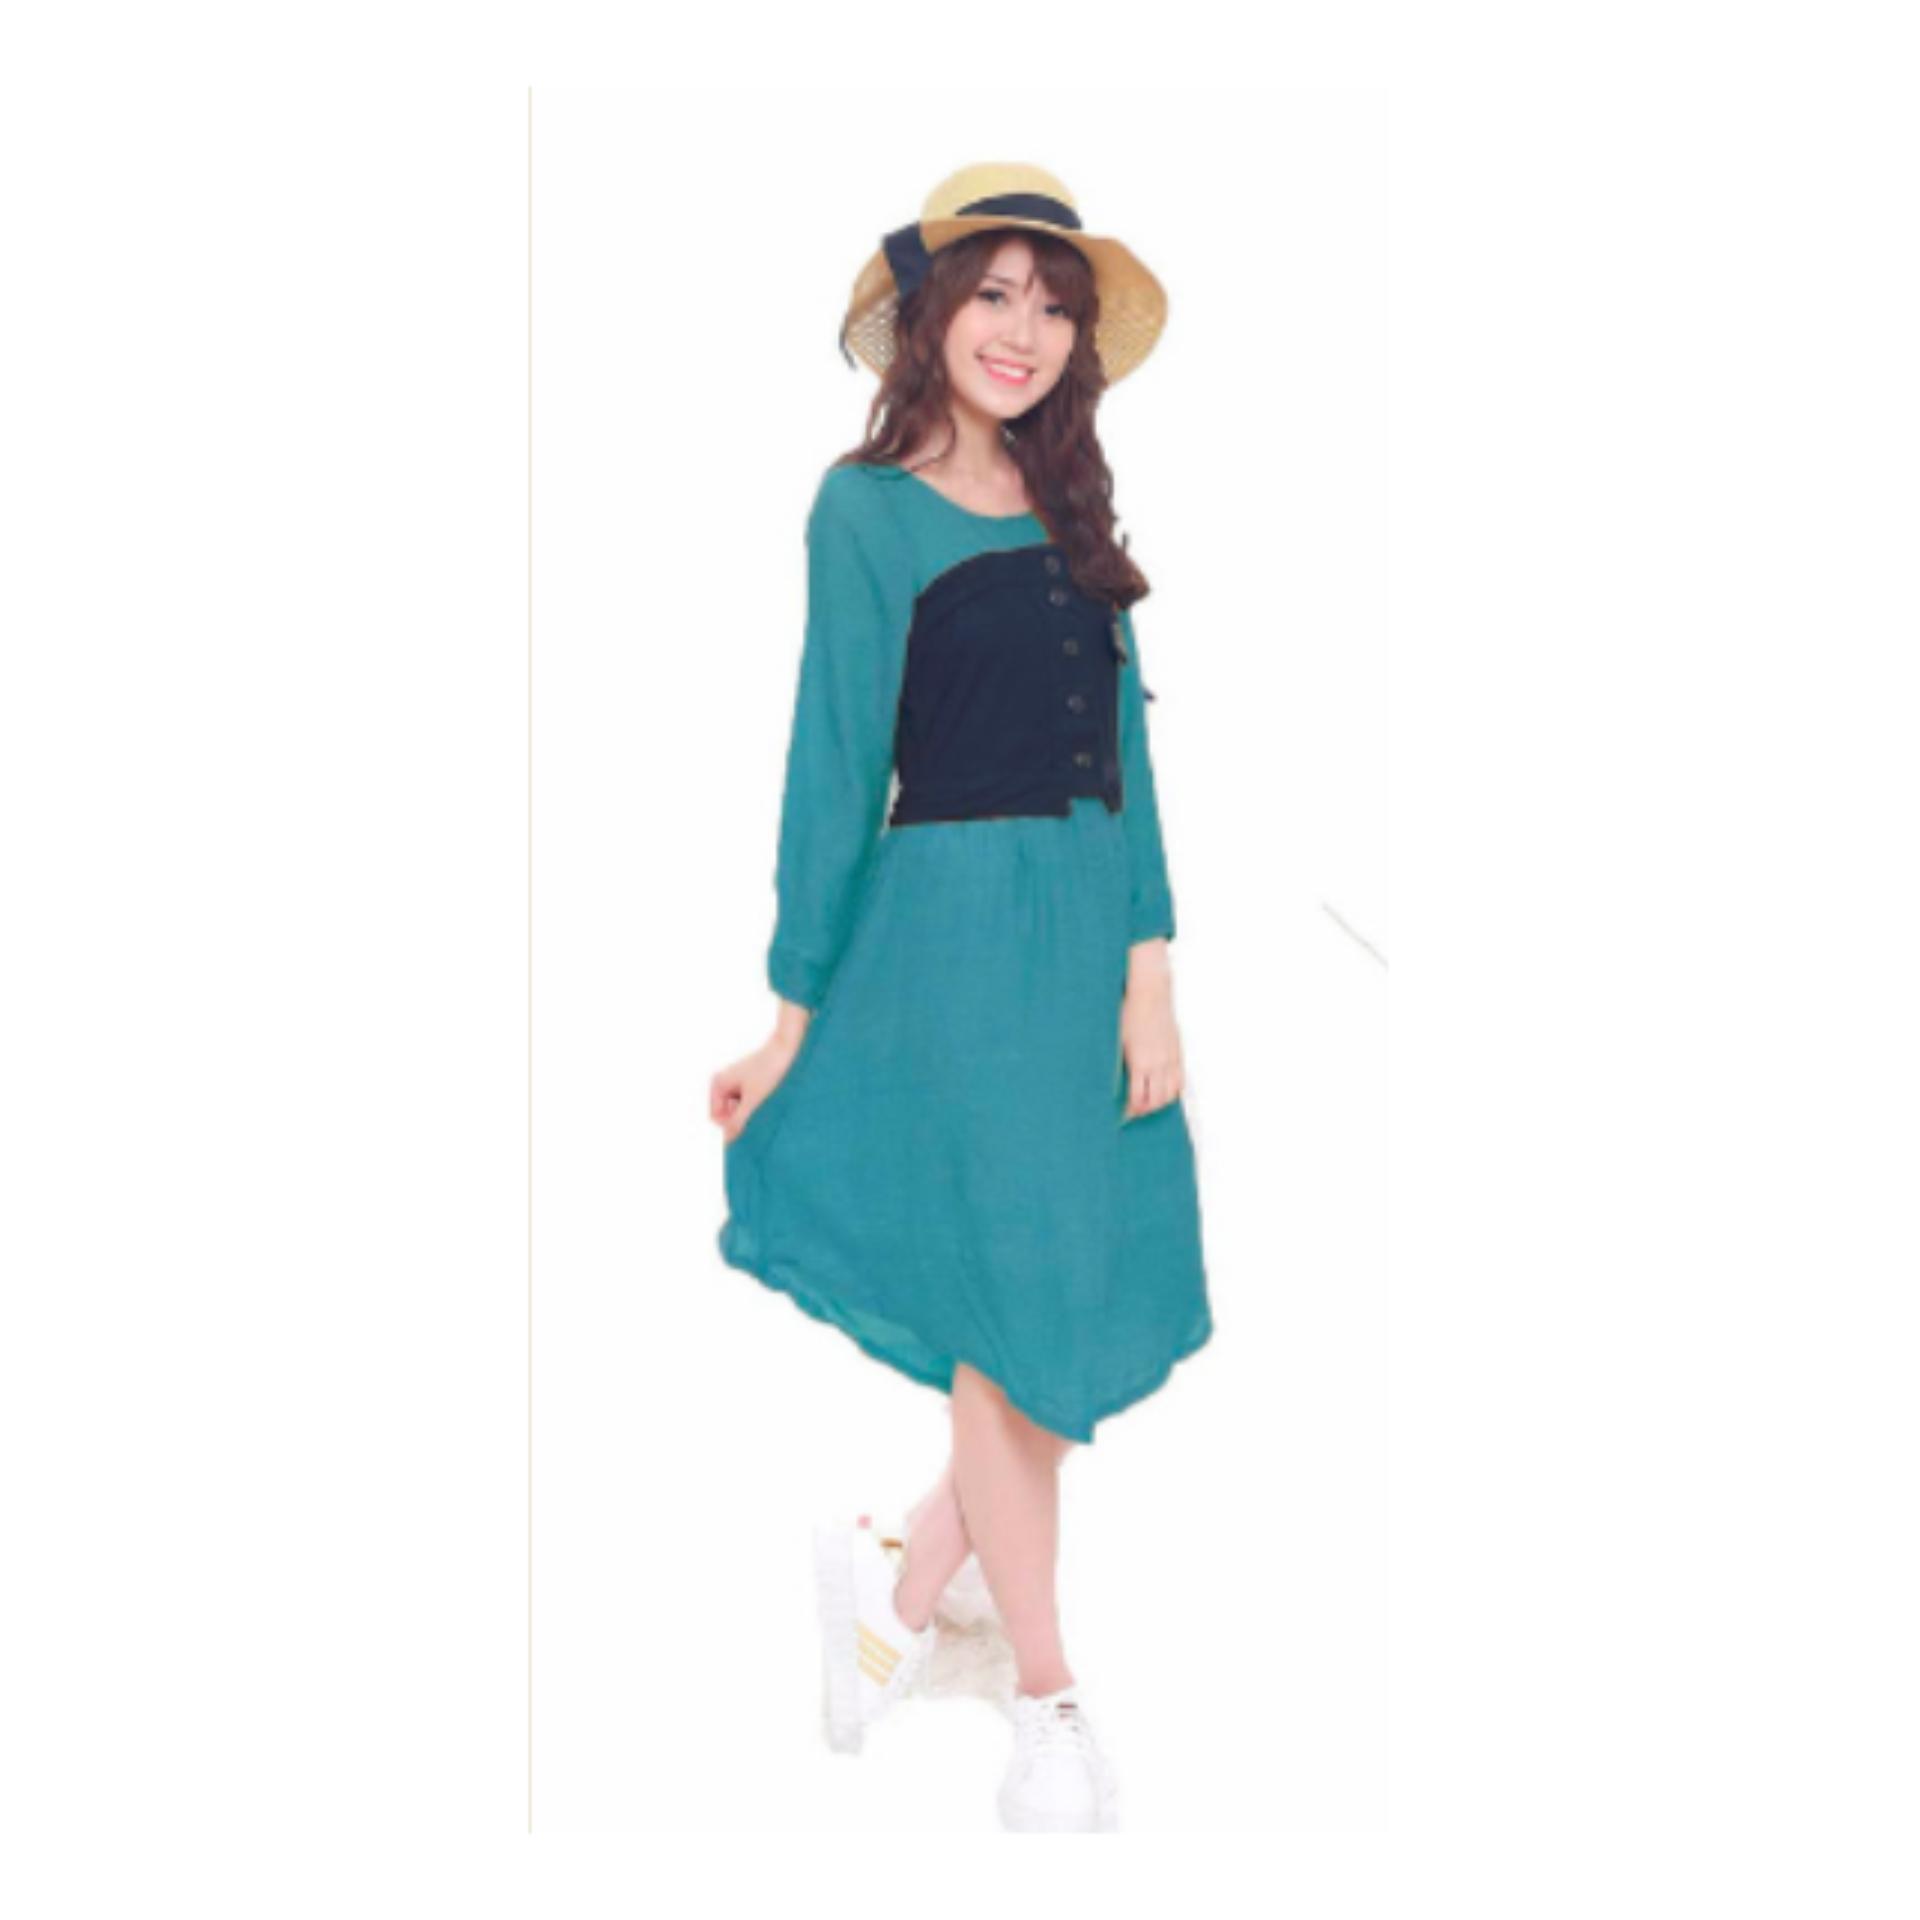 Pakaian Murah wanita gaya korea Kombinasi Gaun cantik simple elegan